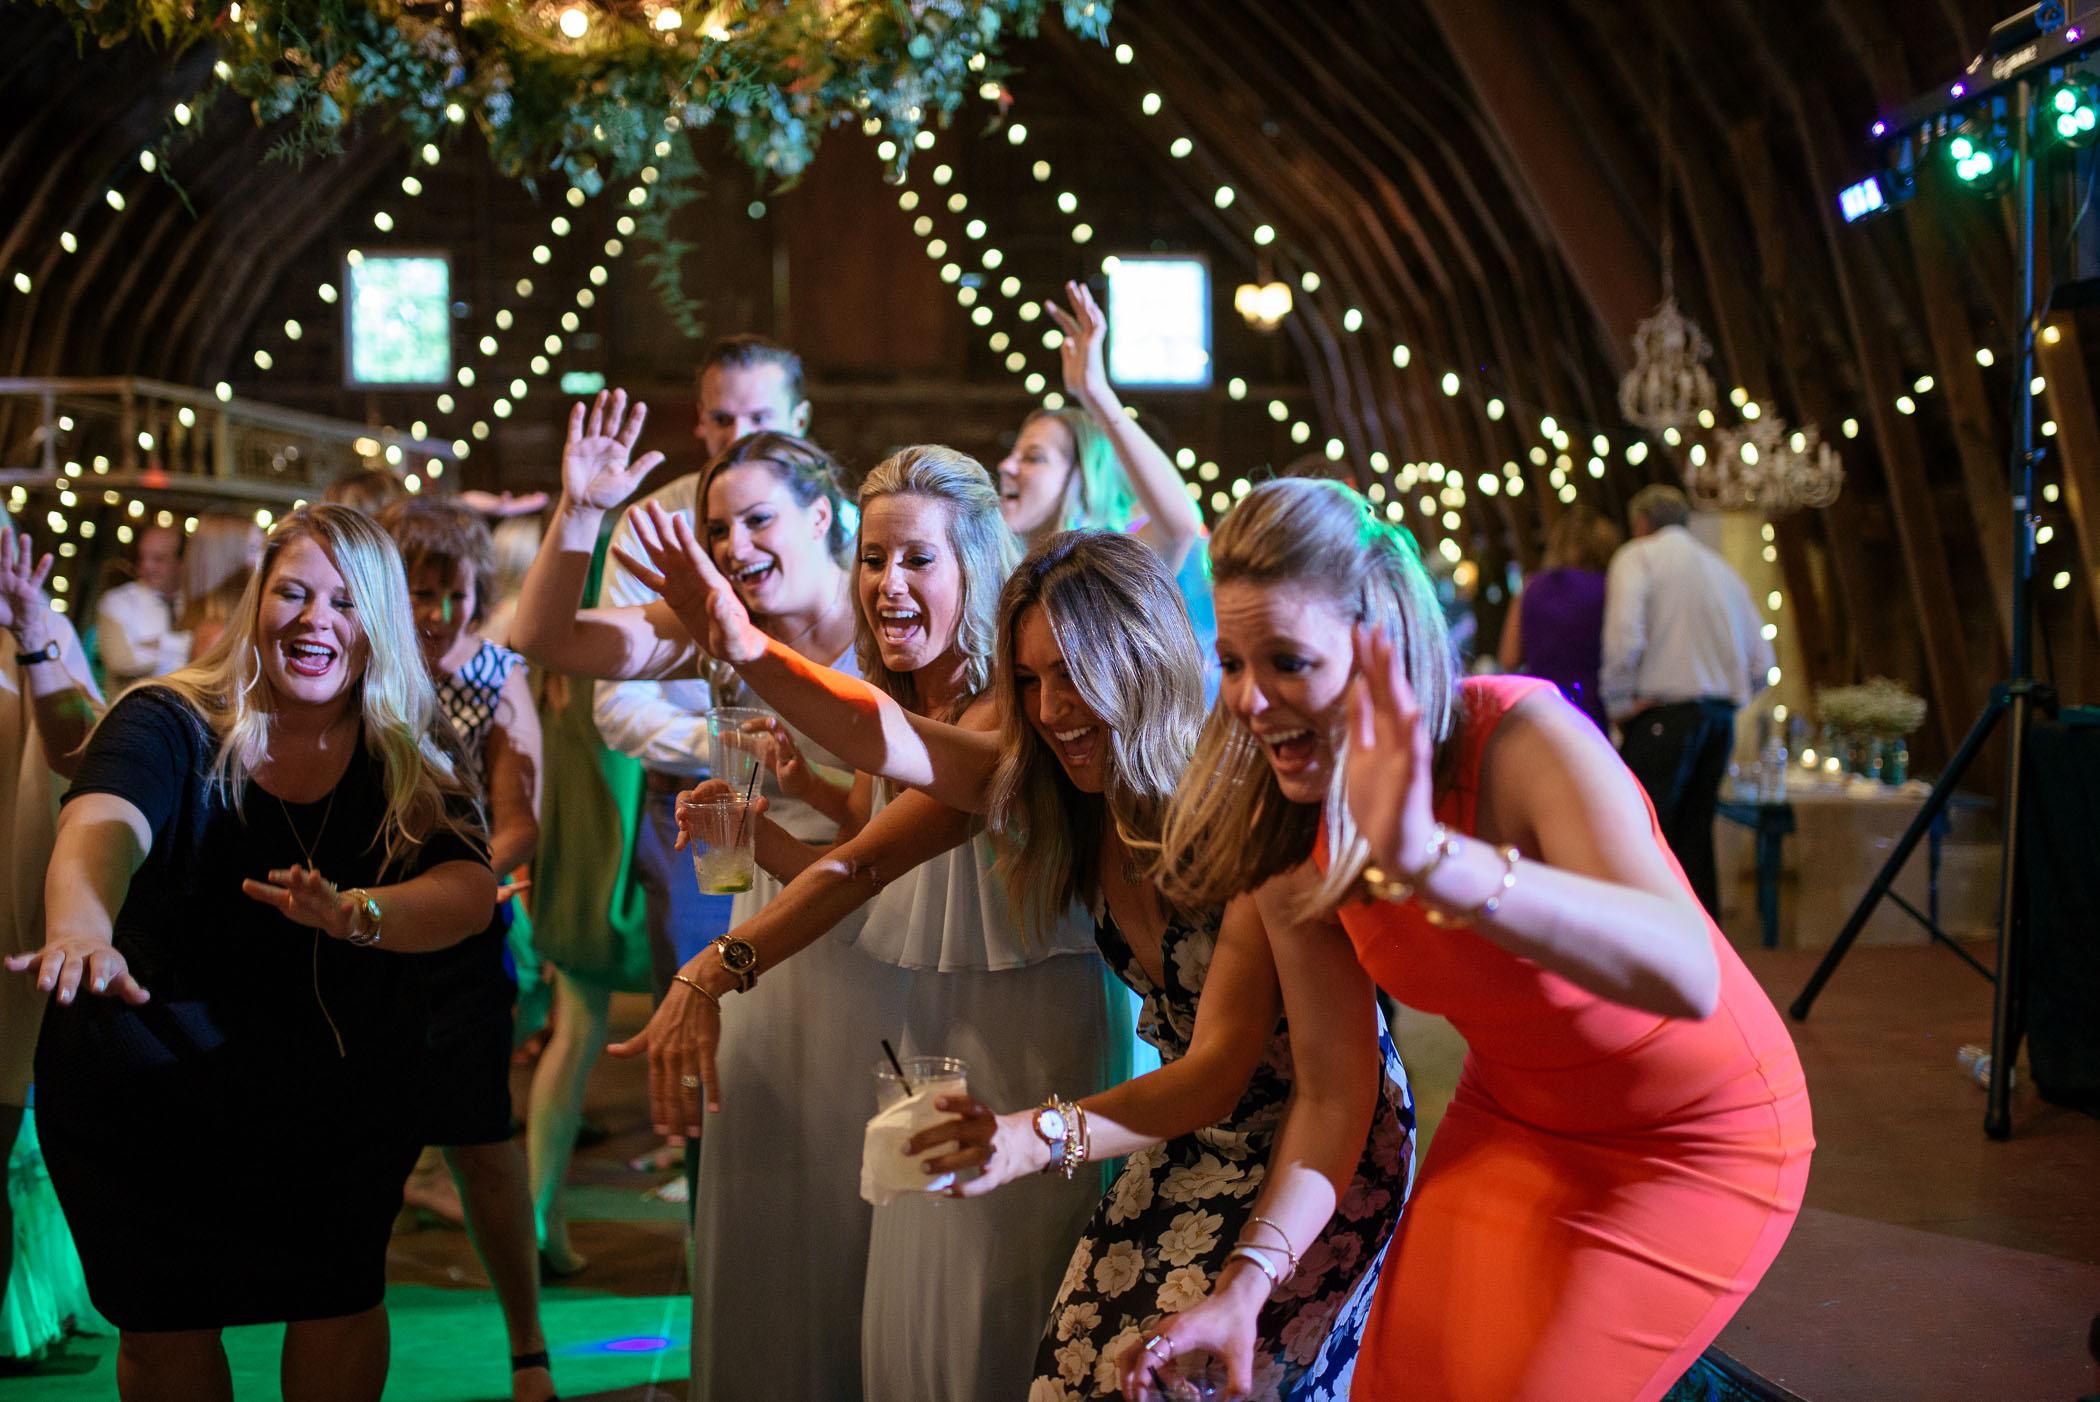 michigan_wedding_at_blue_dress_barn_066.jpg